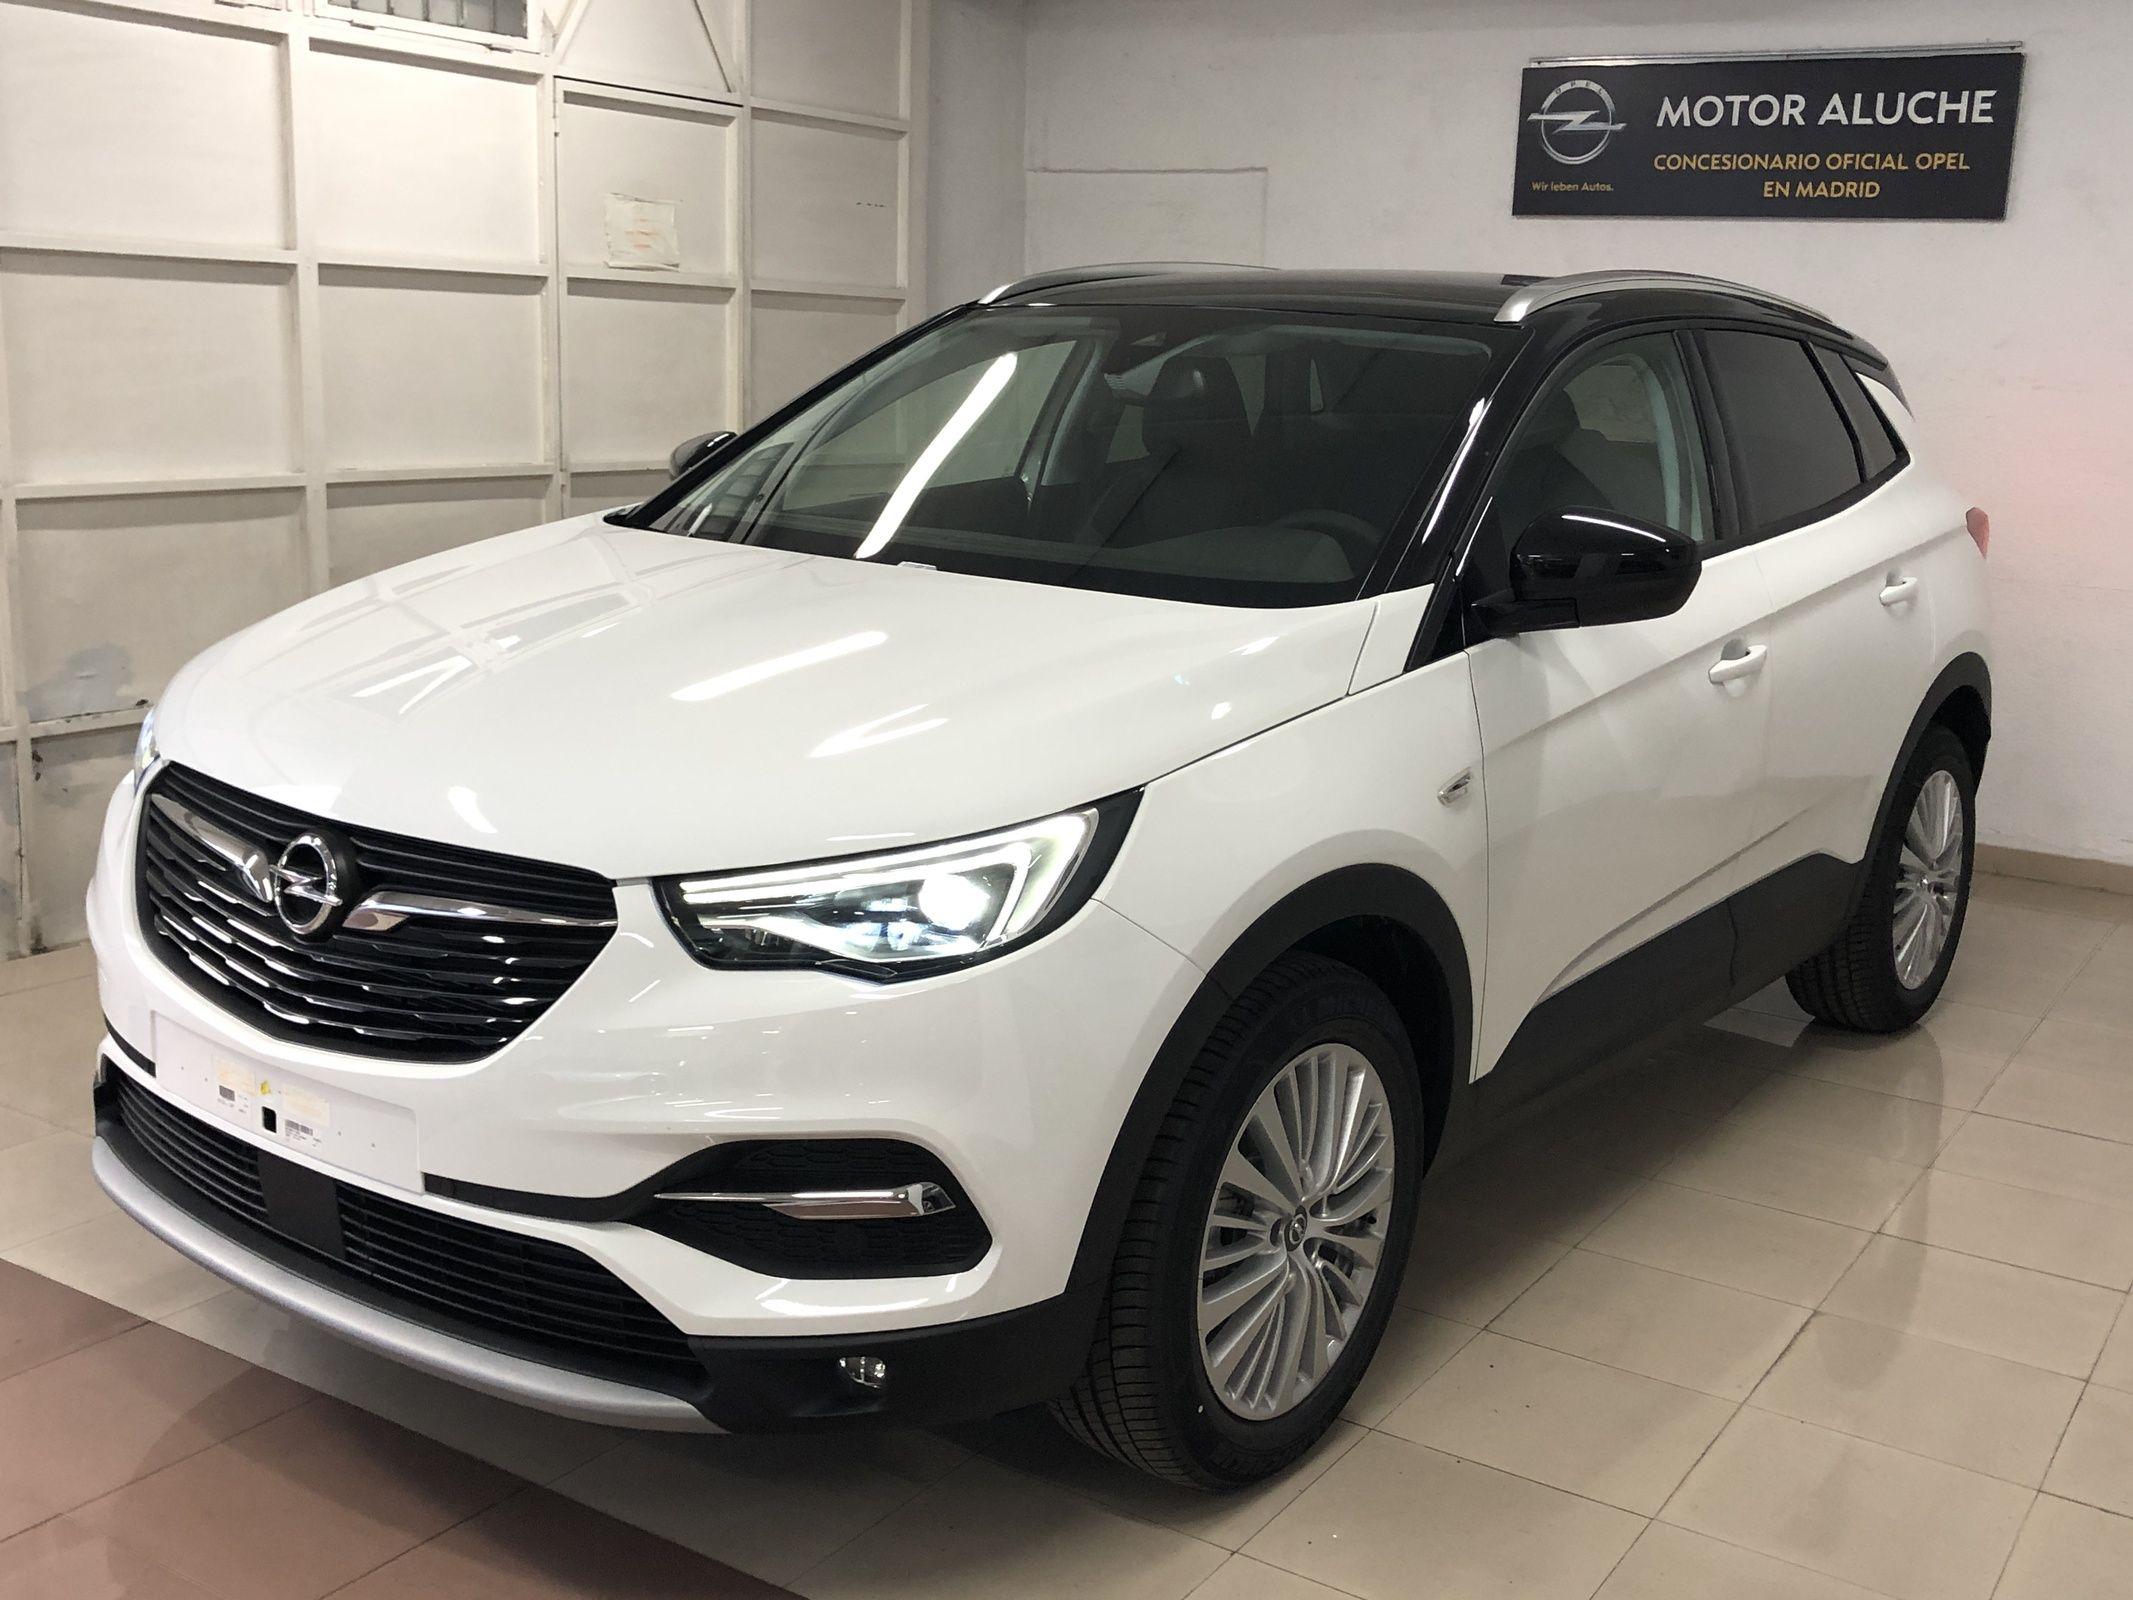 Opel GrandLand X Design Line 1.2 T S&S (130cv) desde 23.490€